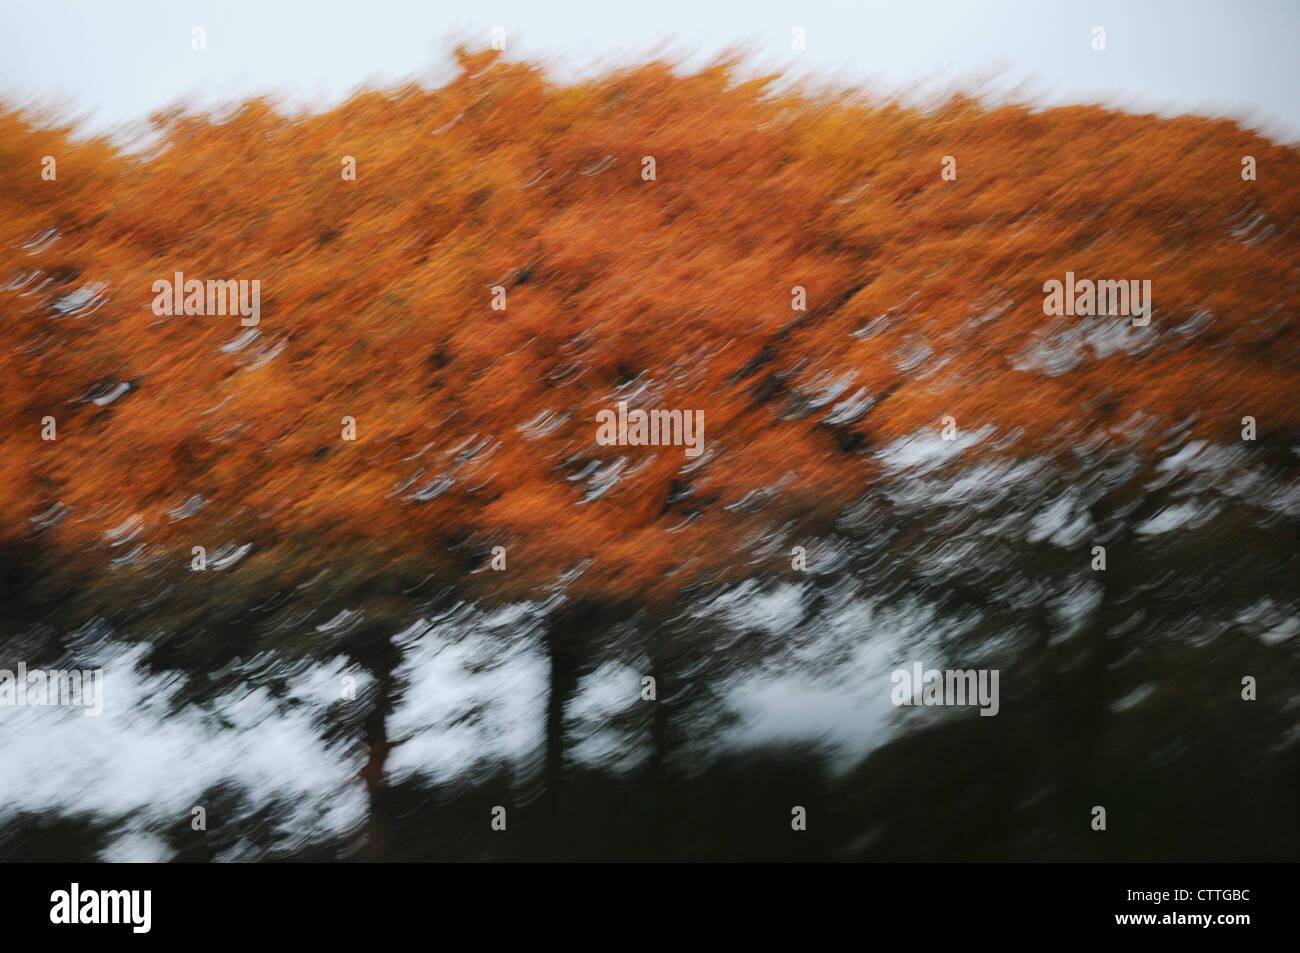 Blurred Beech Trees, Fagus sylvatica  autumnal golden orange russet brown beech trees - Stock Image